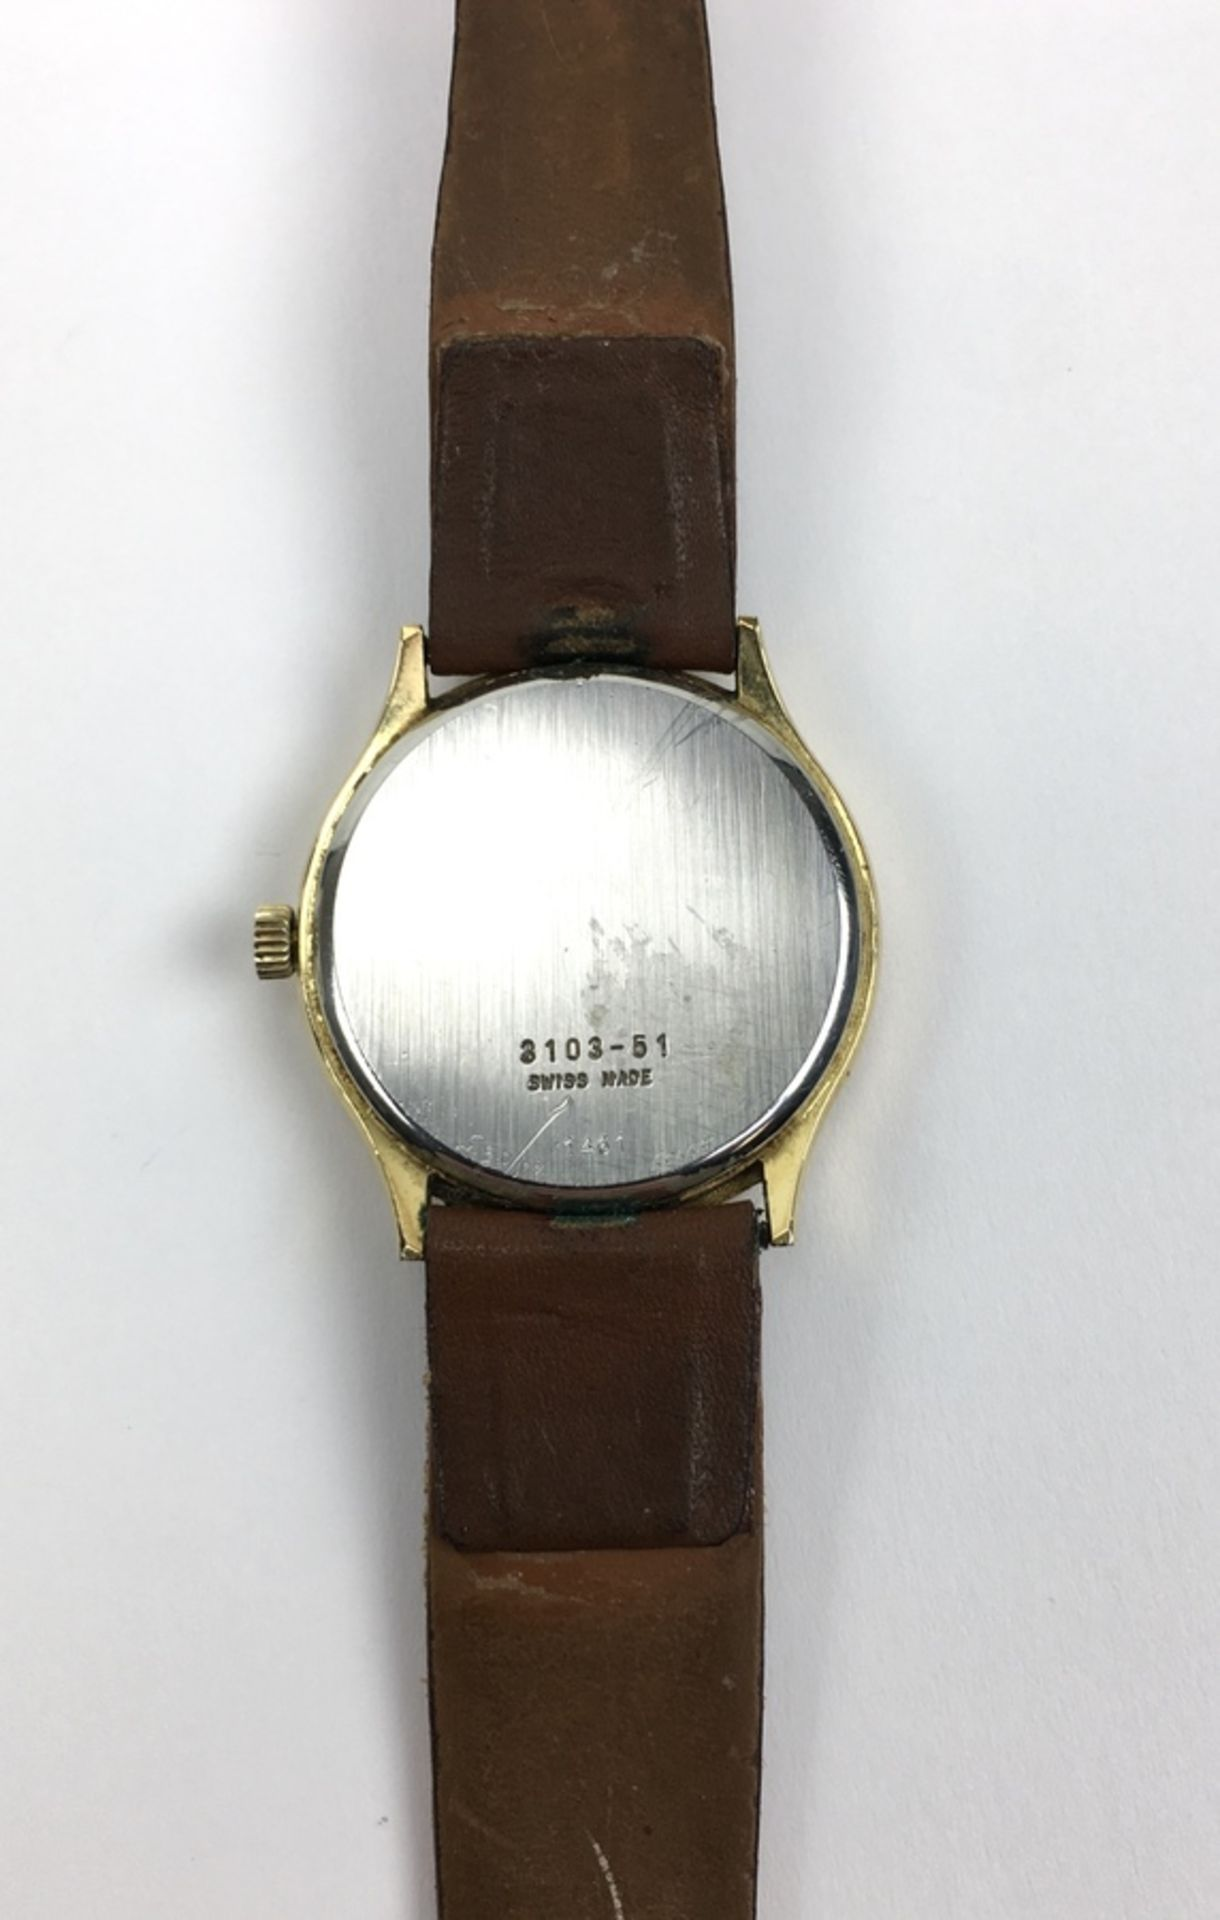 (Sieraden) Horloge Favre-Leuba GeneveVintage heren horloge Favre-Leuba Geneve. Conditie: In wer - Image 3 of 3